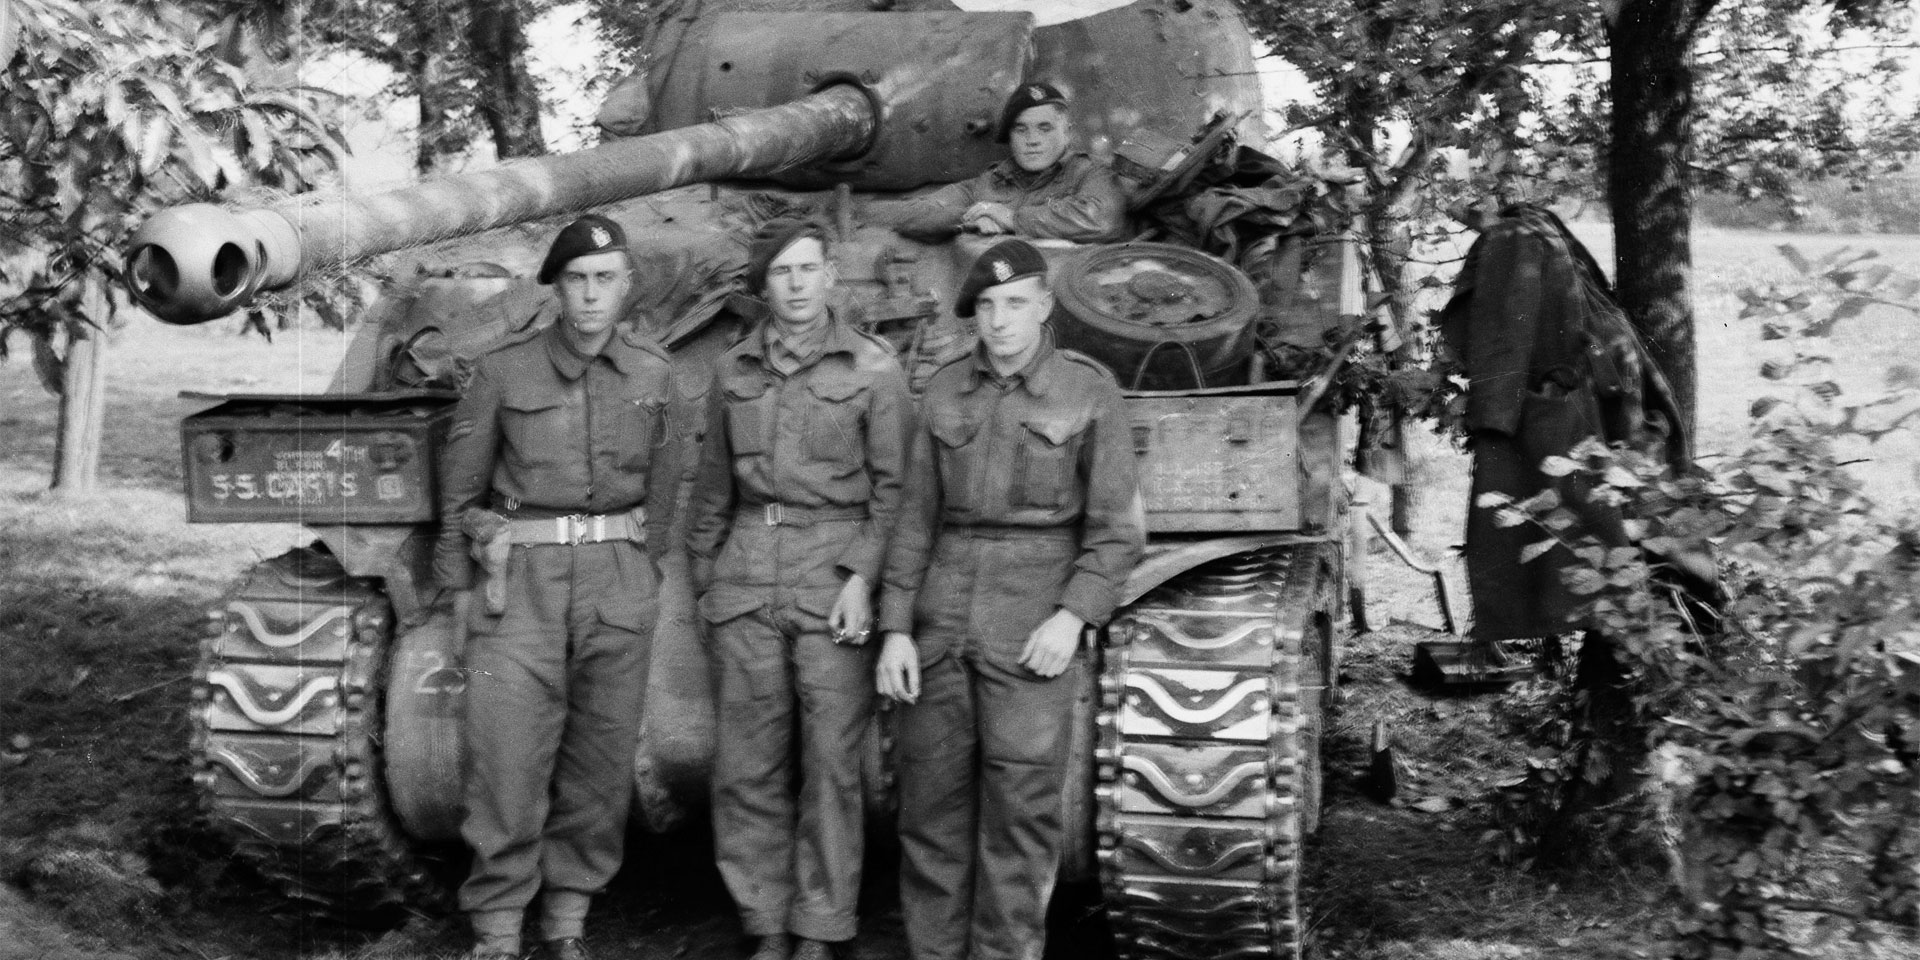 Crewmen of a Sherman Firefly, 1944